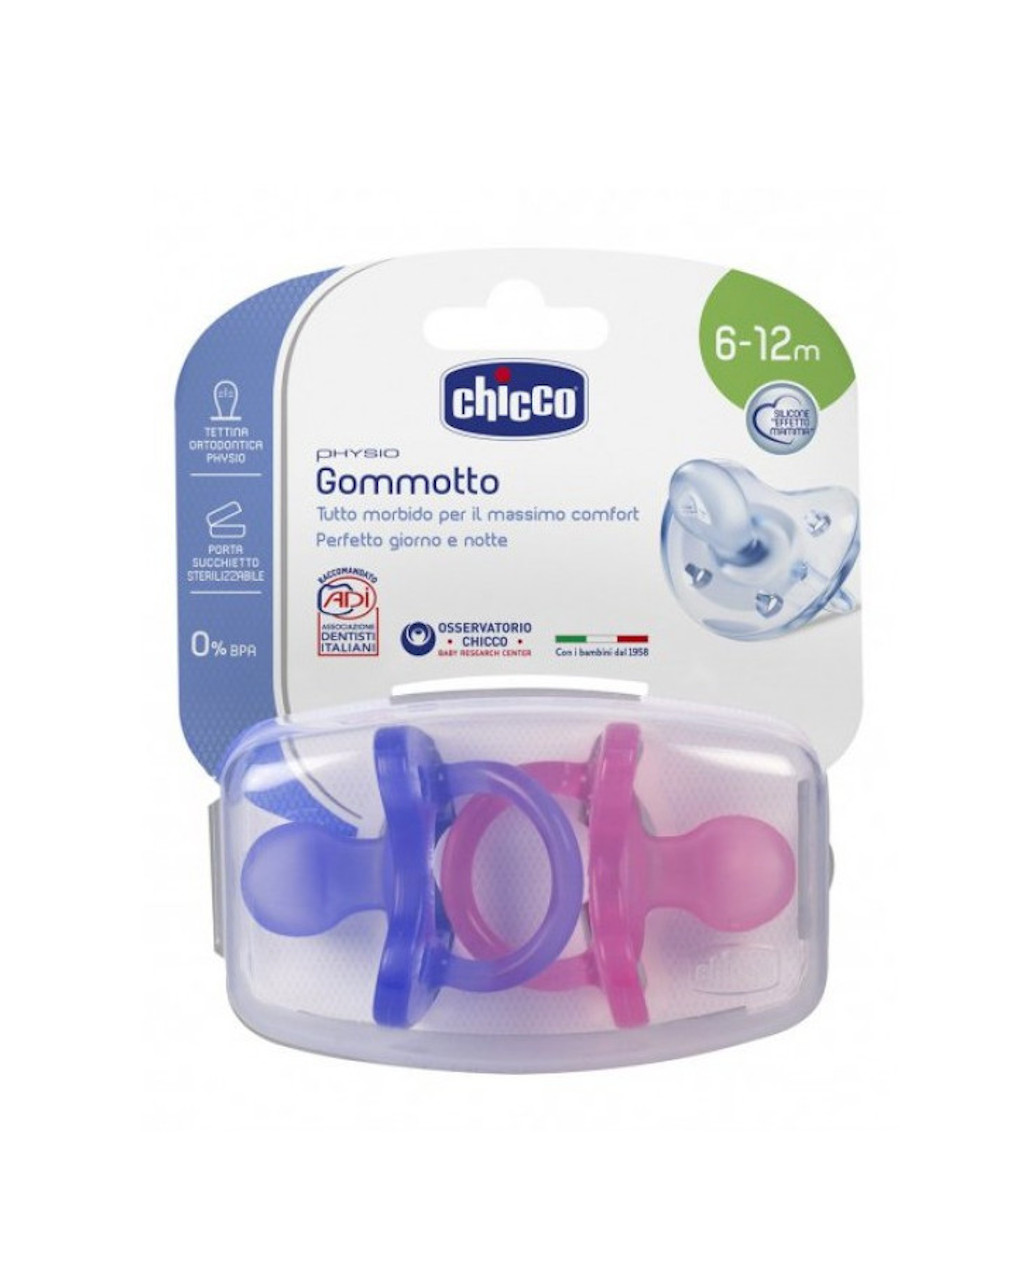 Gommotto physio silicone bimba 6-12m 2pezzi - Chicco